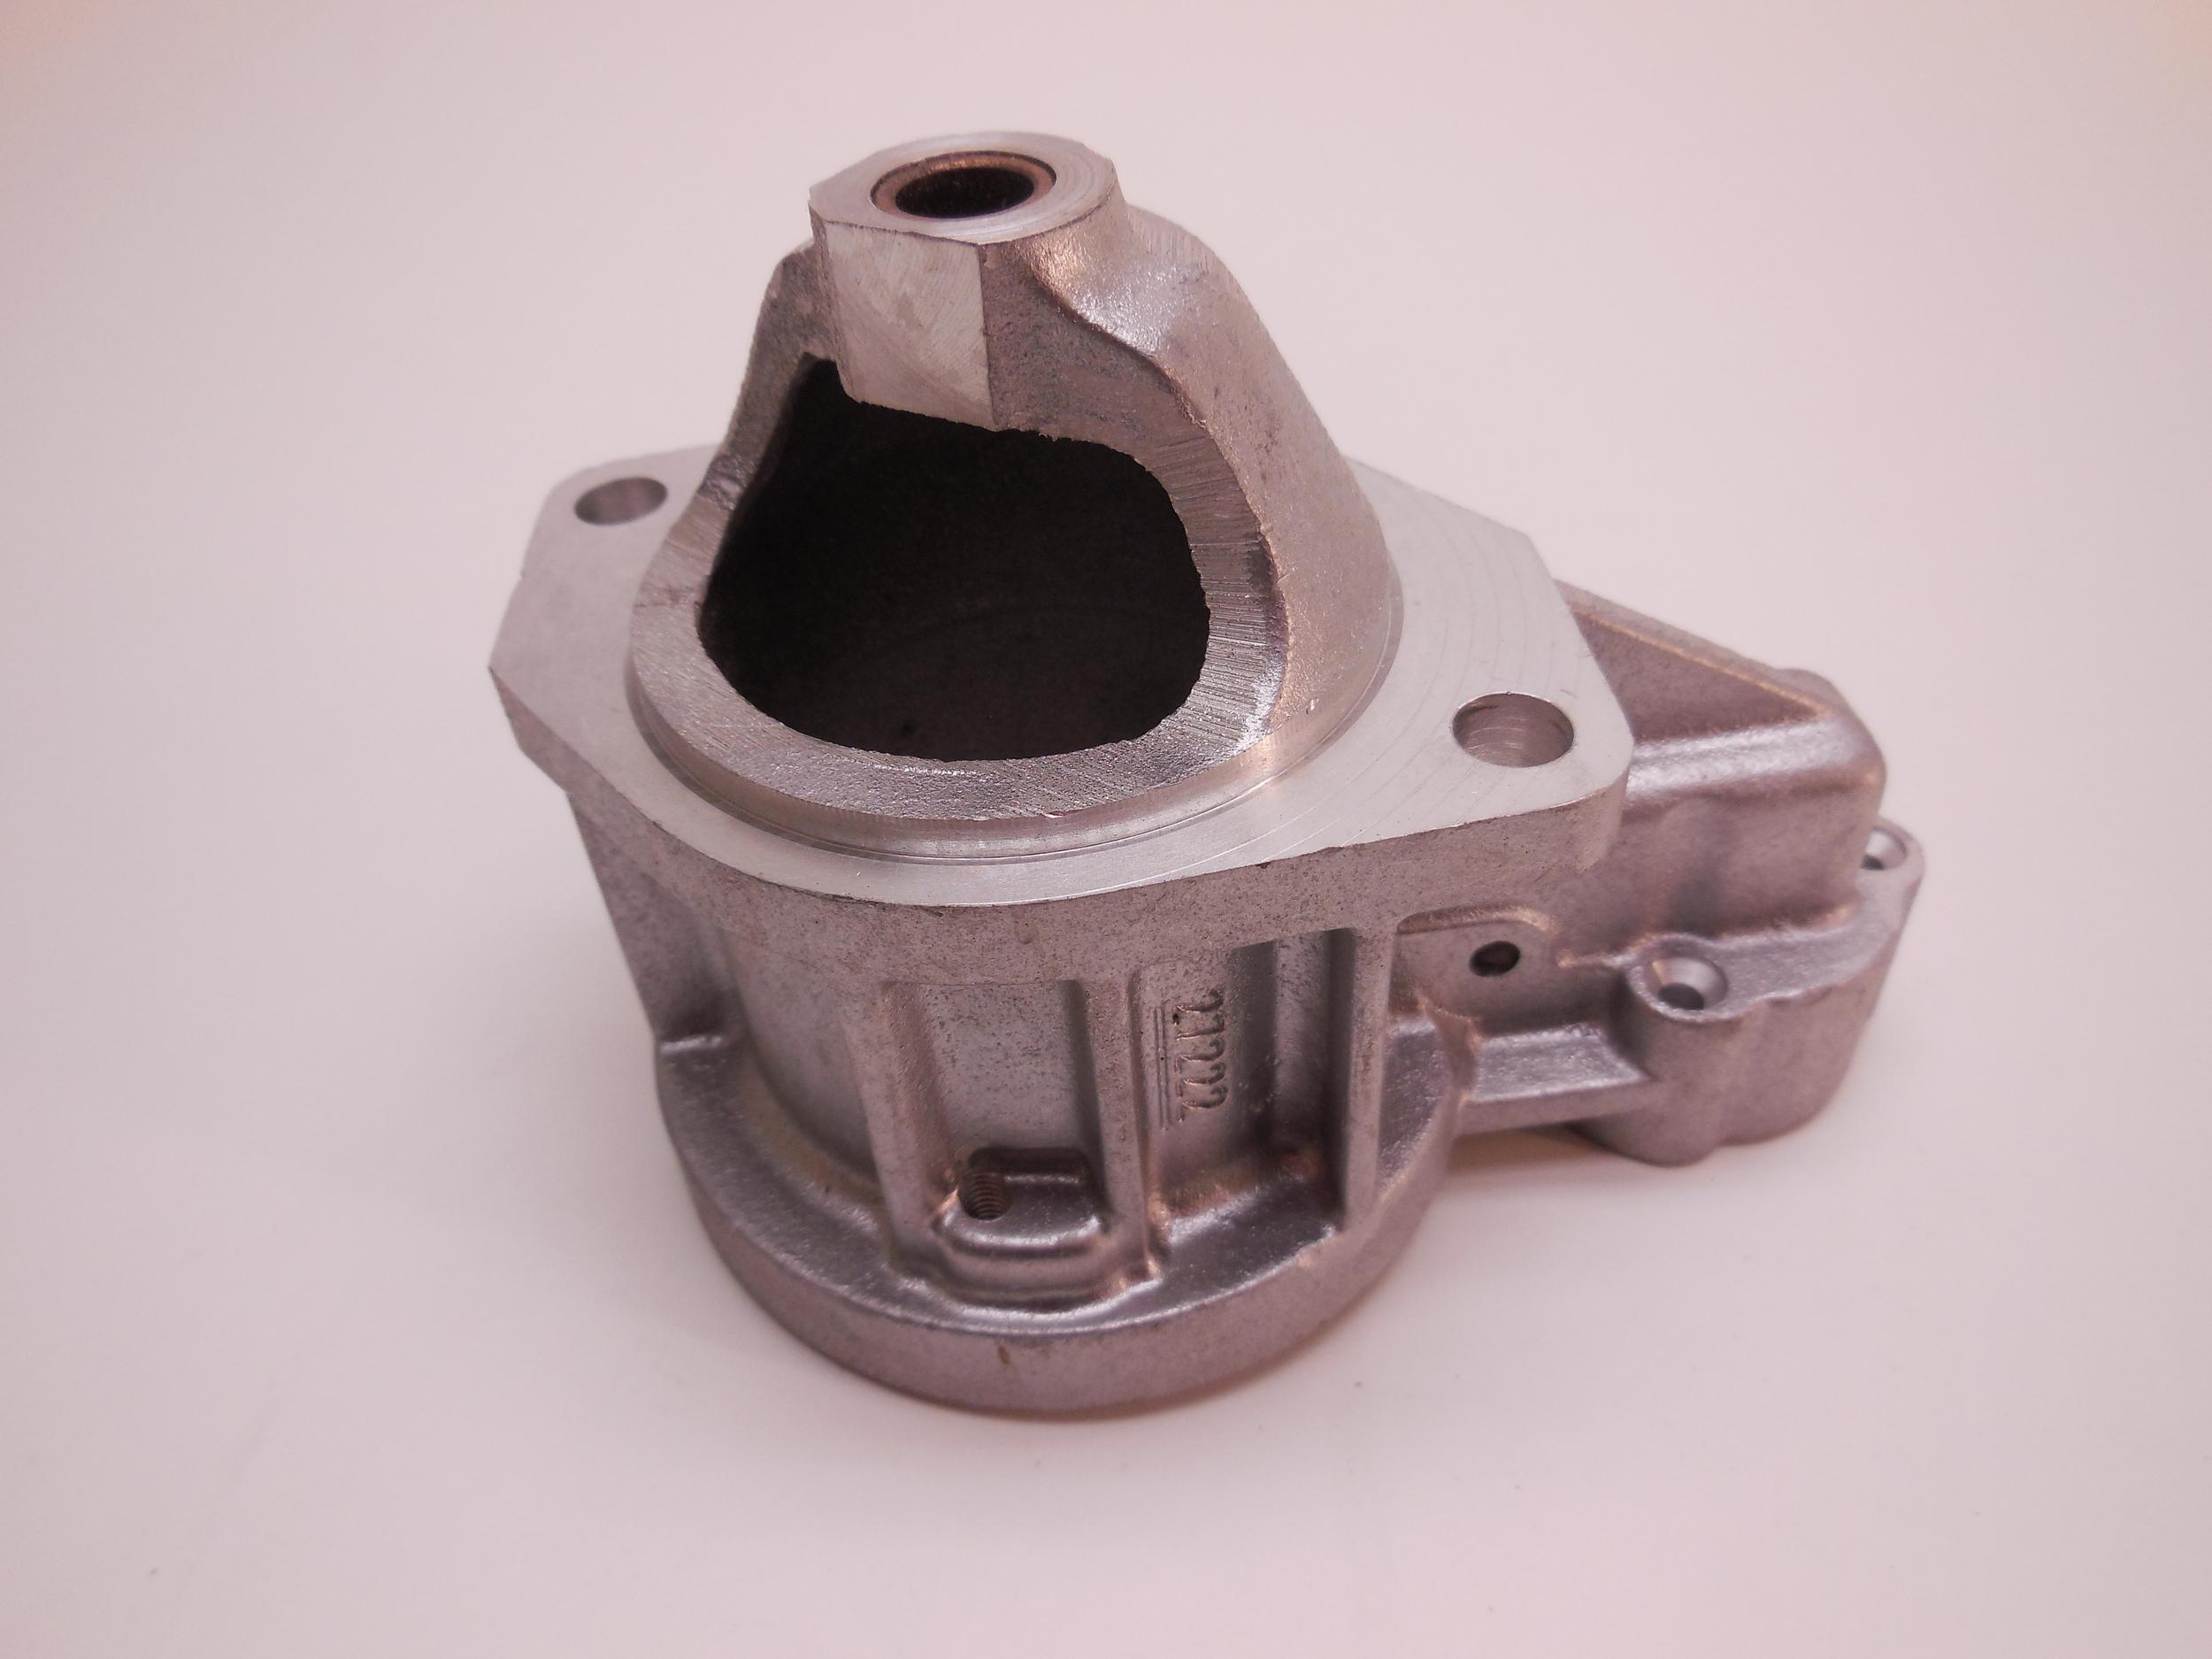 starter repair kit Bosch Nr: 1 005 823 093 price: 1290 SEK